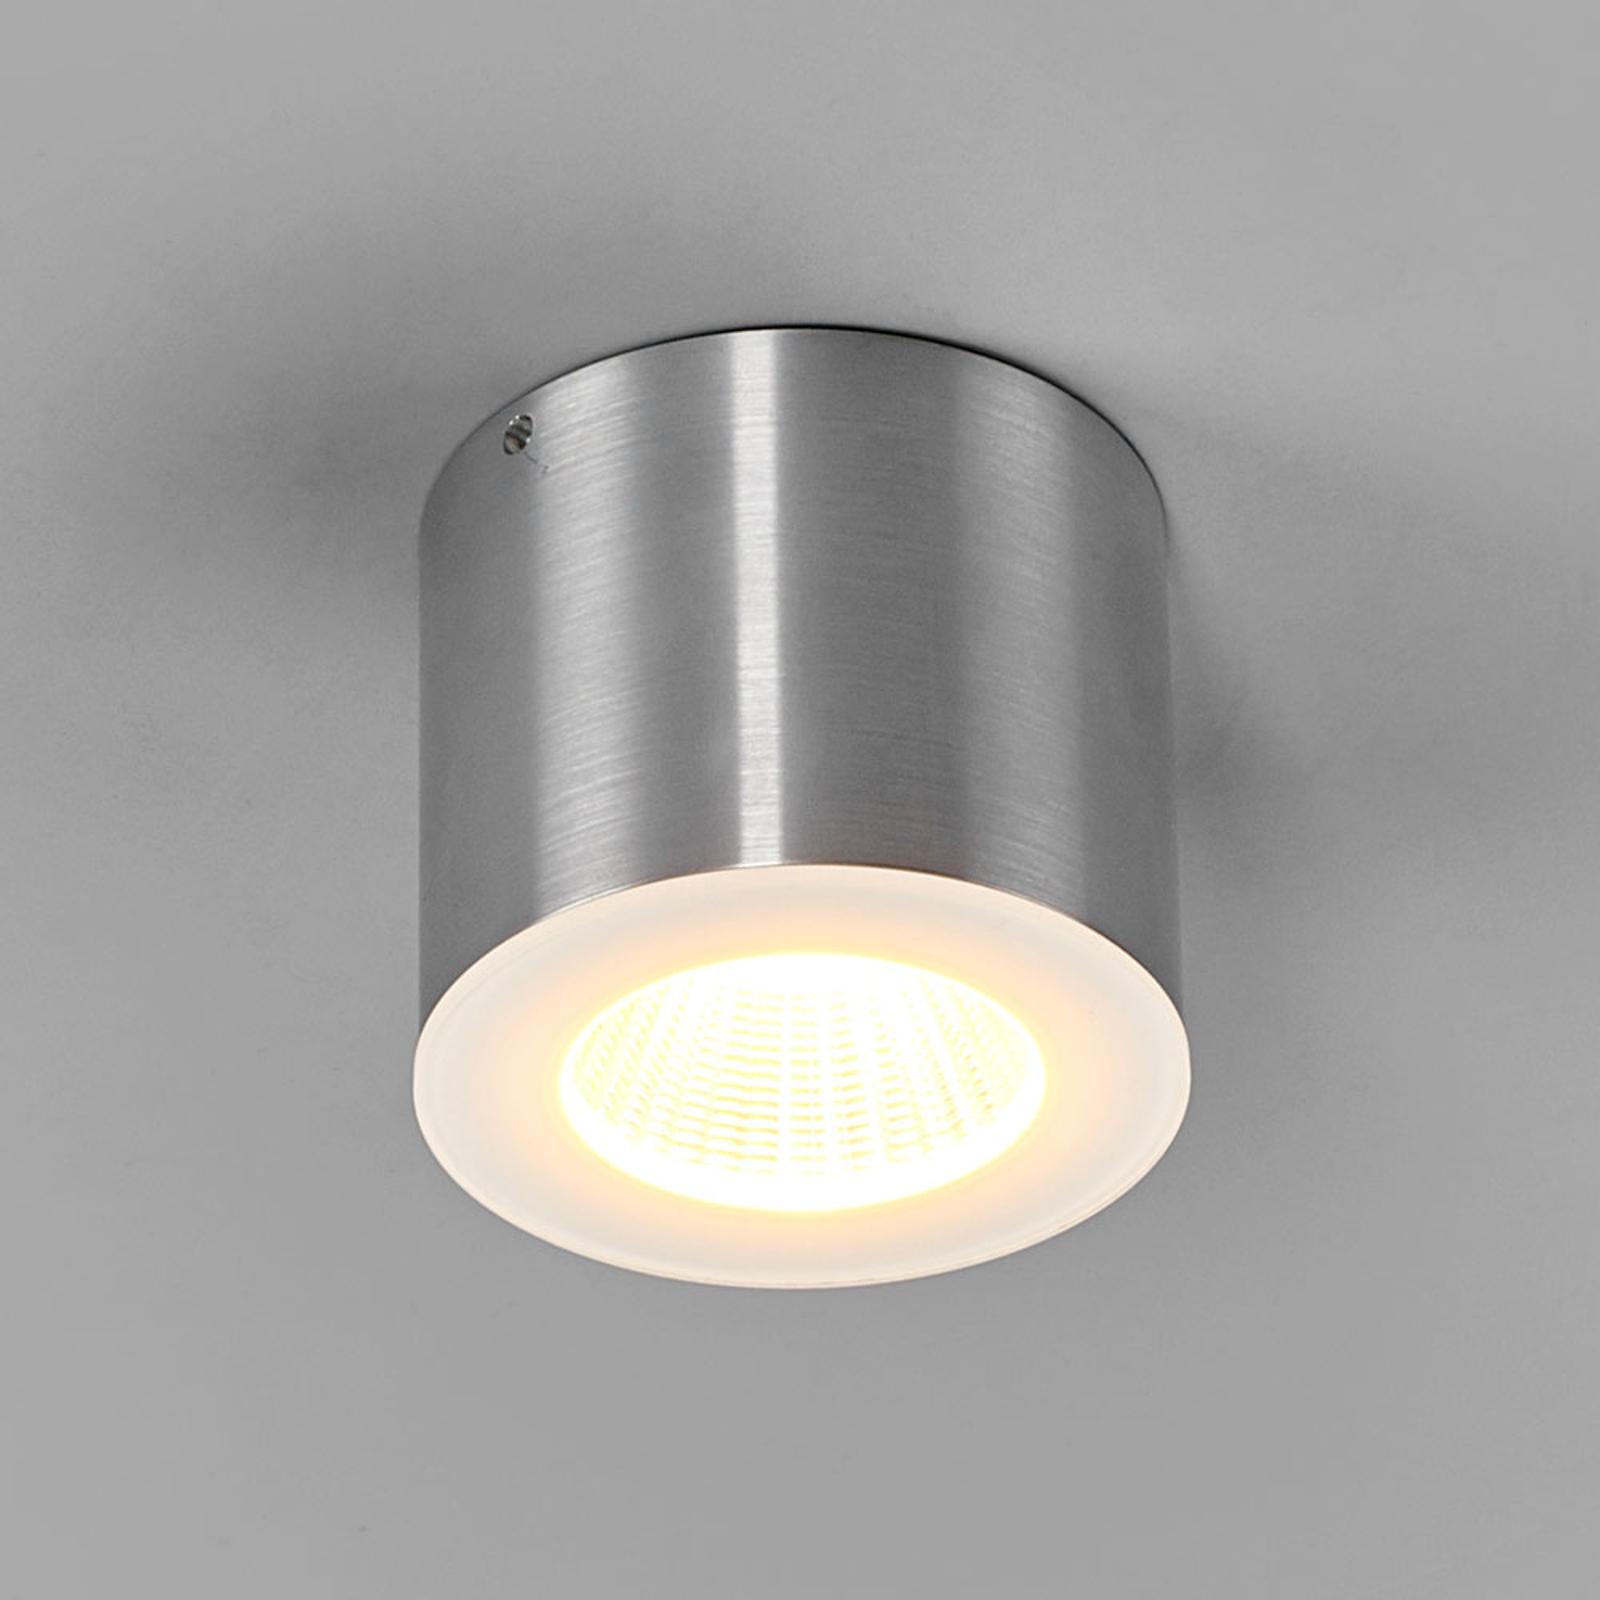 Helestra Oso LED-Deckenspot, rund, alu matt